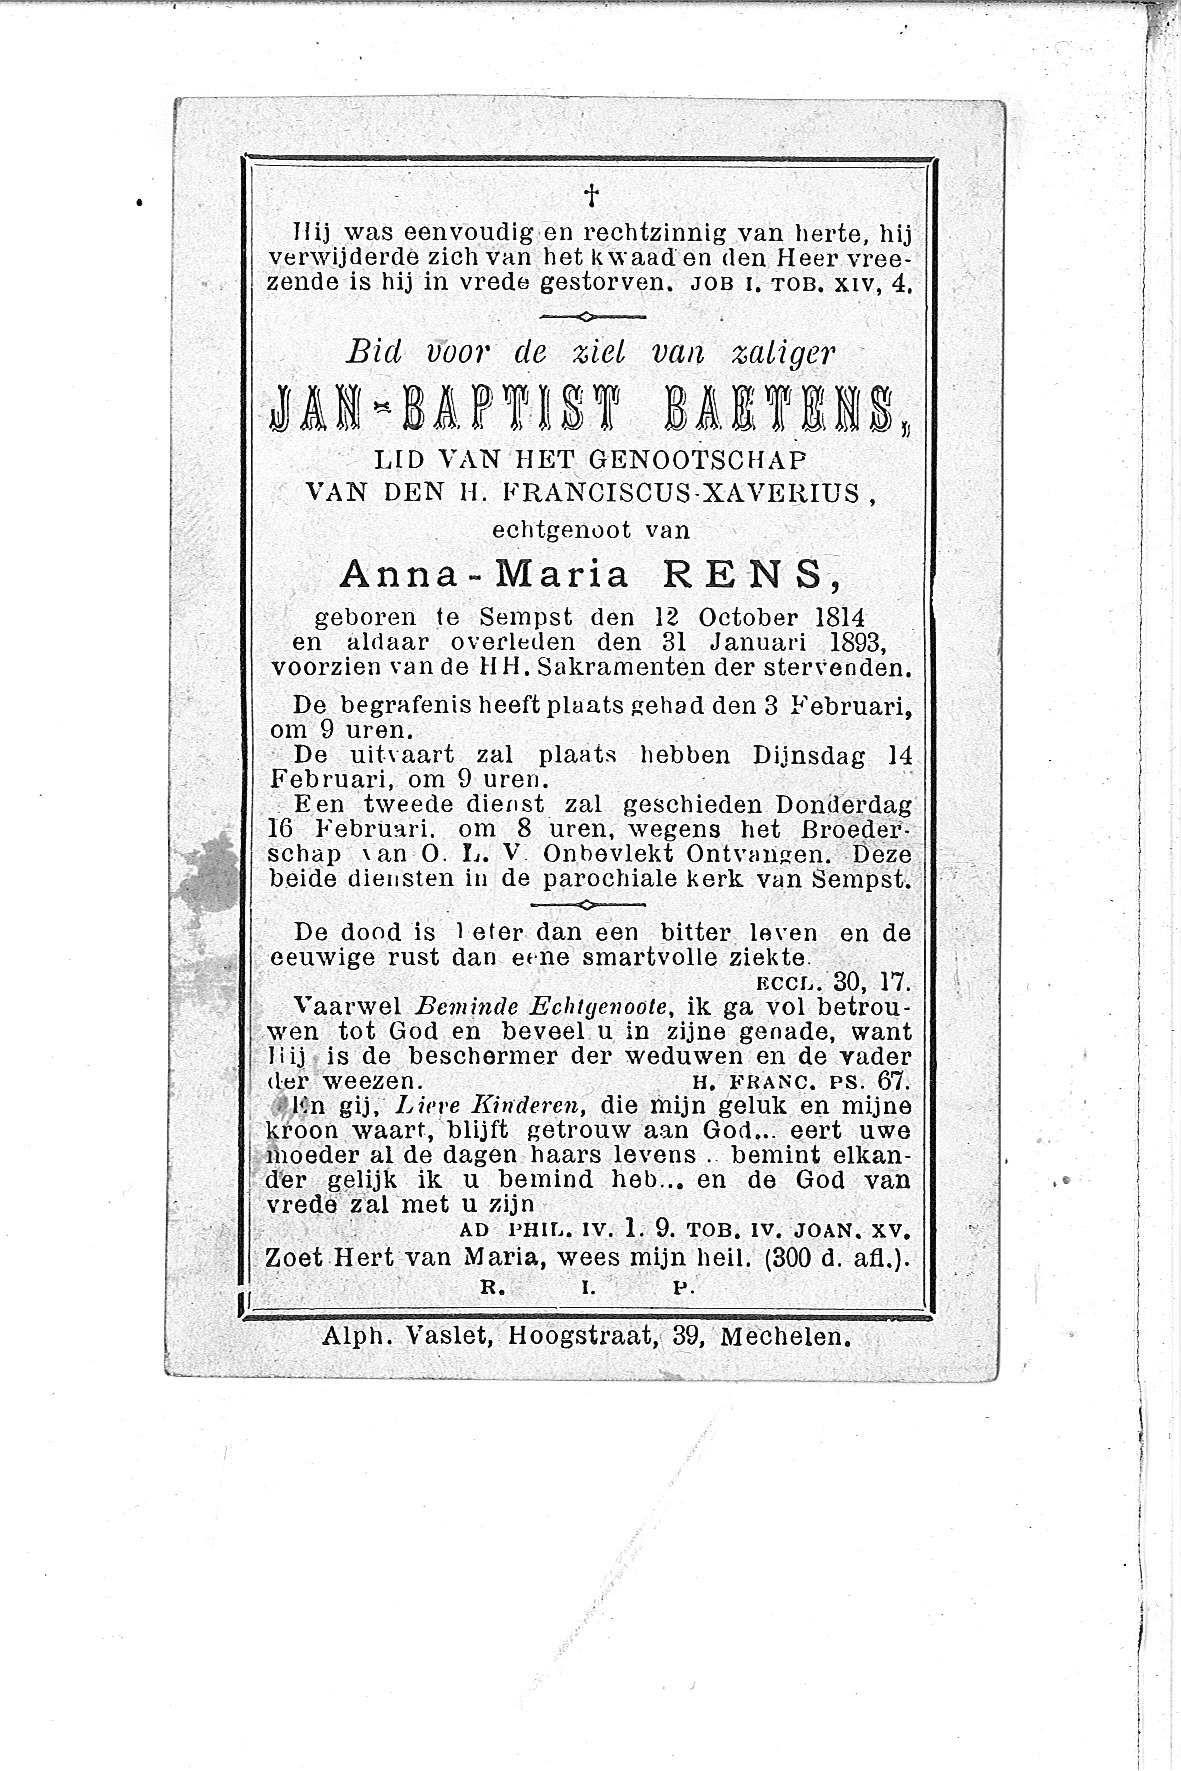 Jan-Baptist(1893)20101004091156_00005.jpg